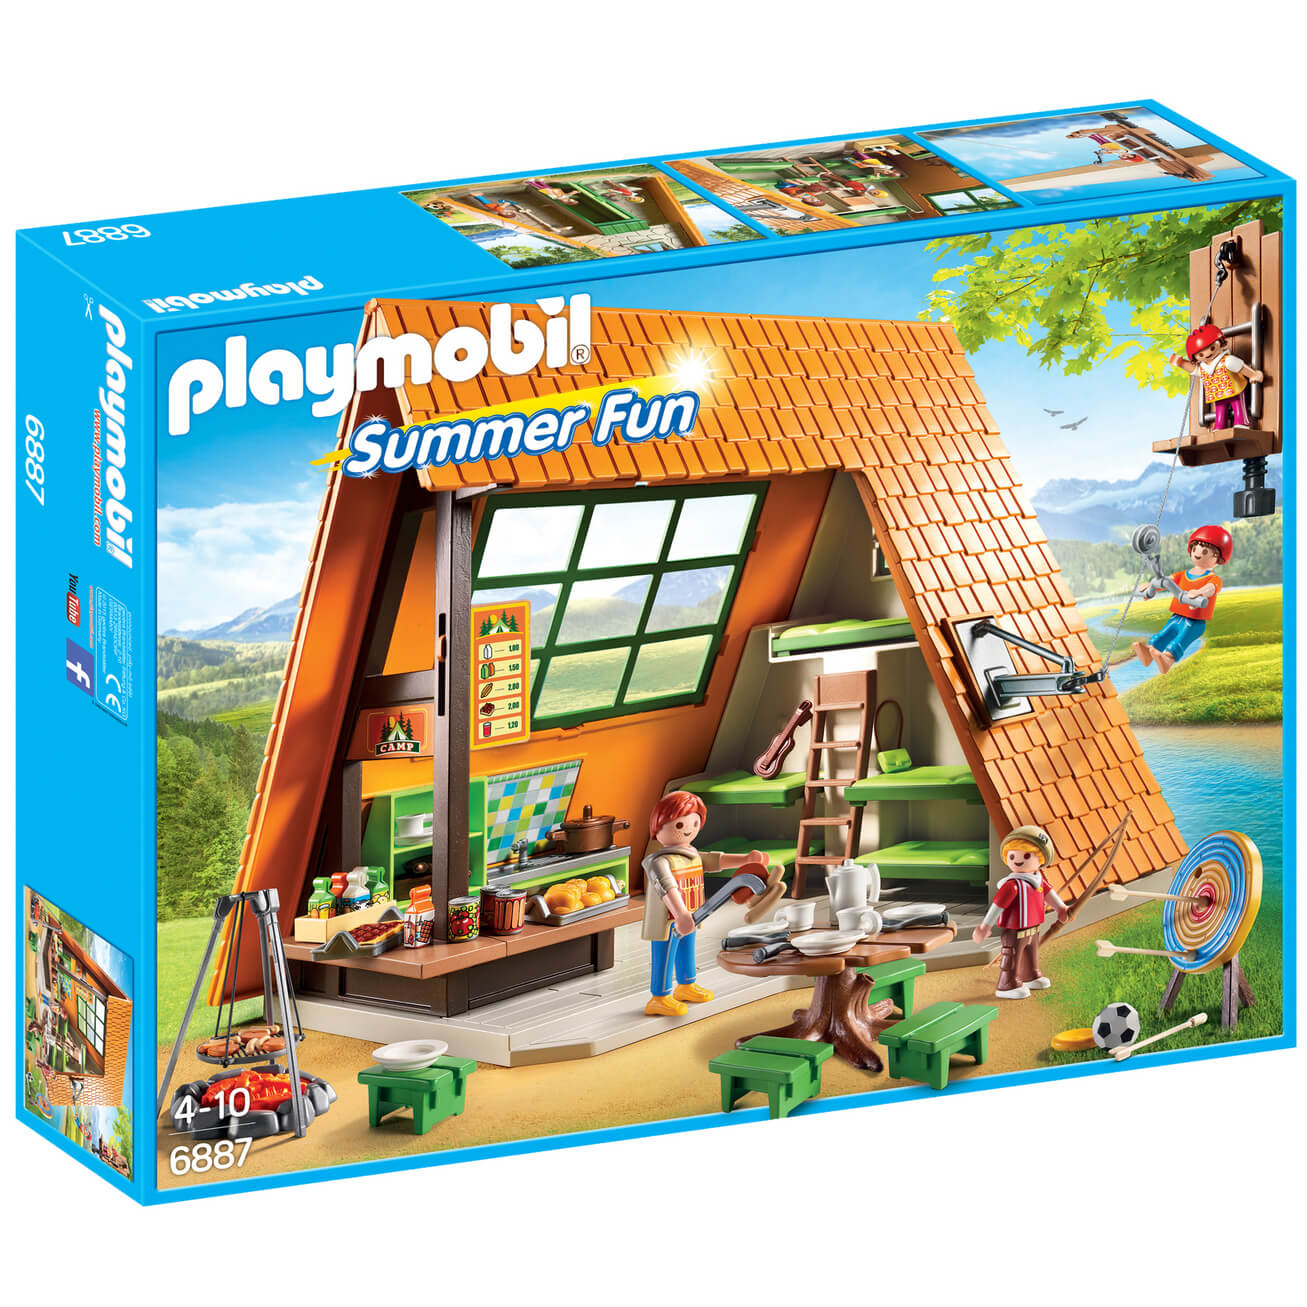 Playmobil Summer Fun Camping Lodge (6887) | IWOOT